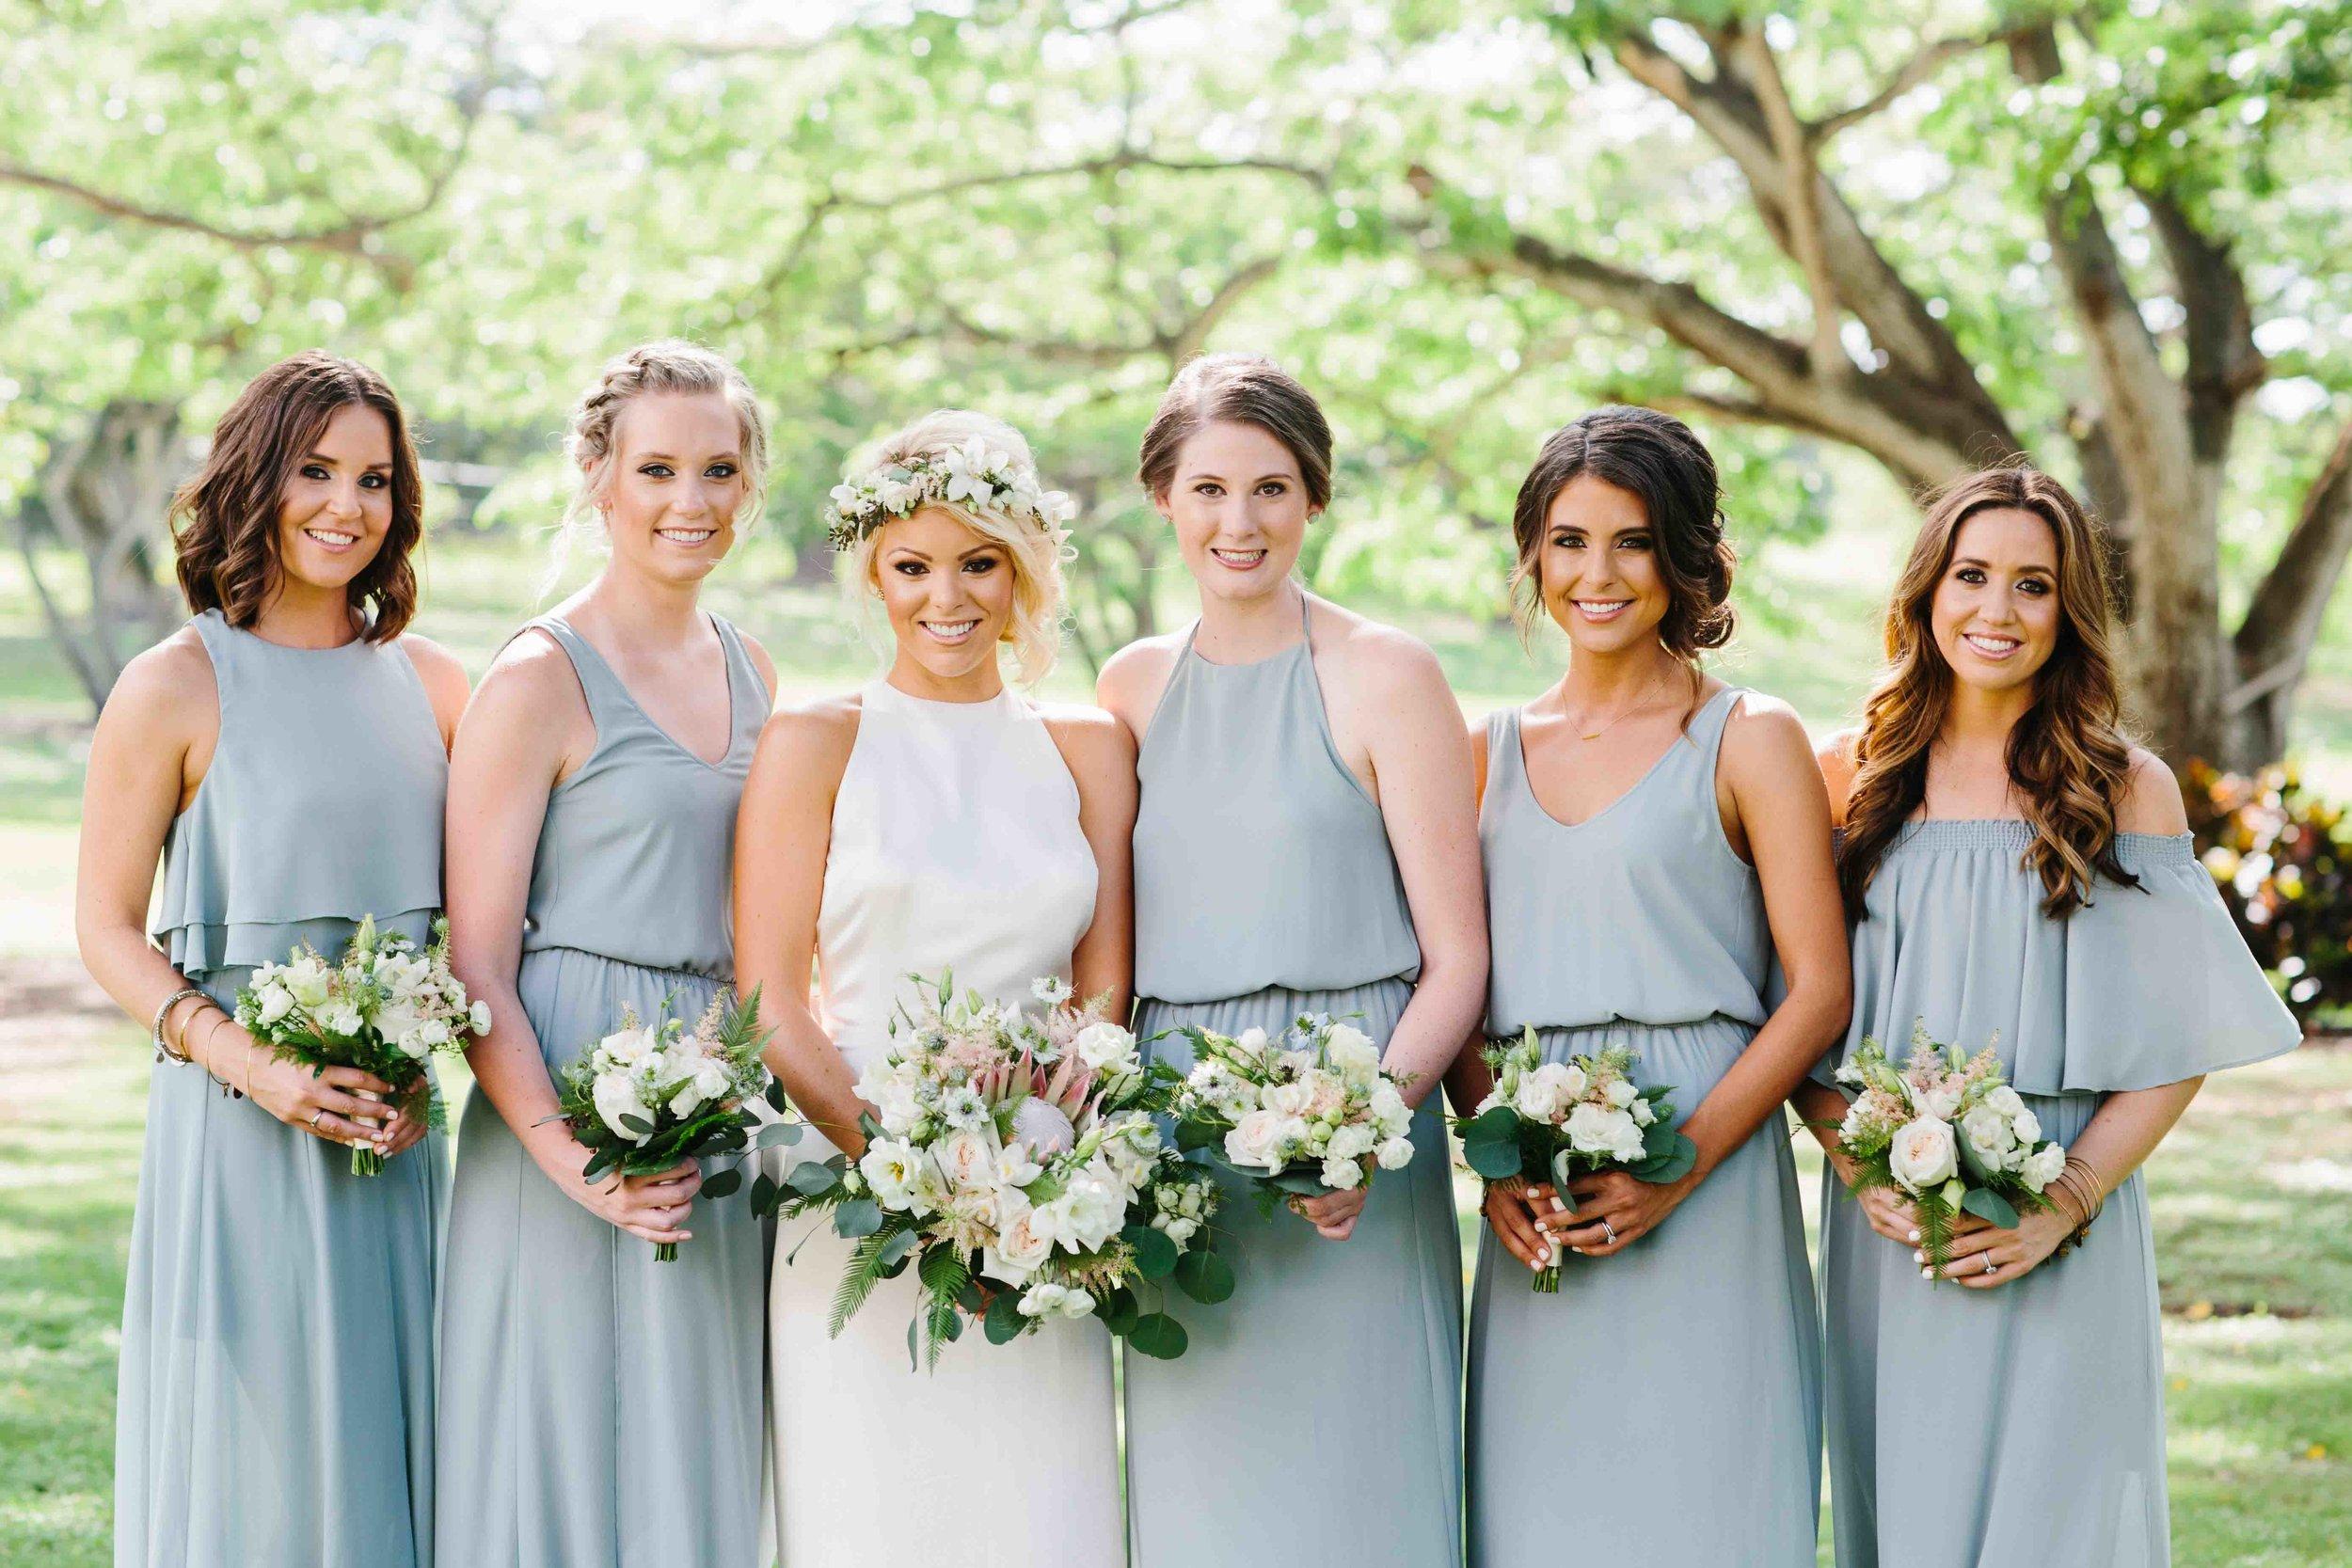 Bride & Bridesmaids at Dillingham Ranch